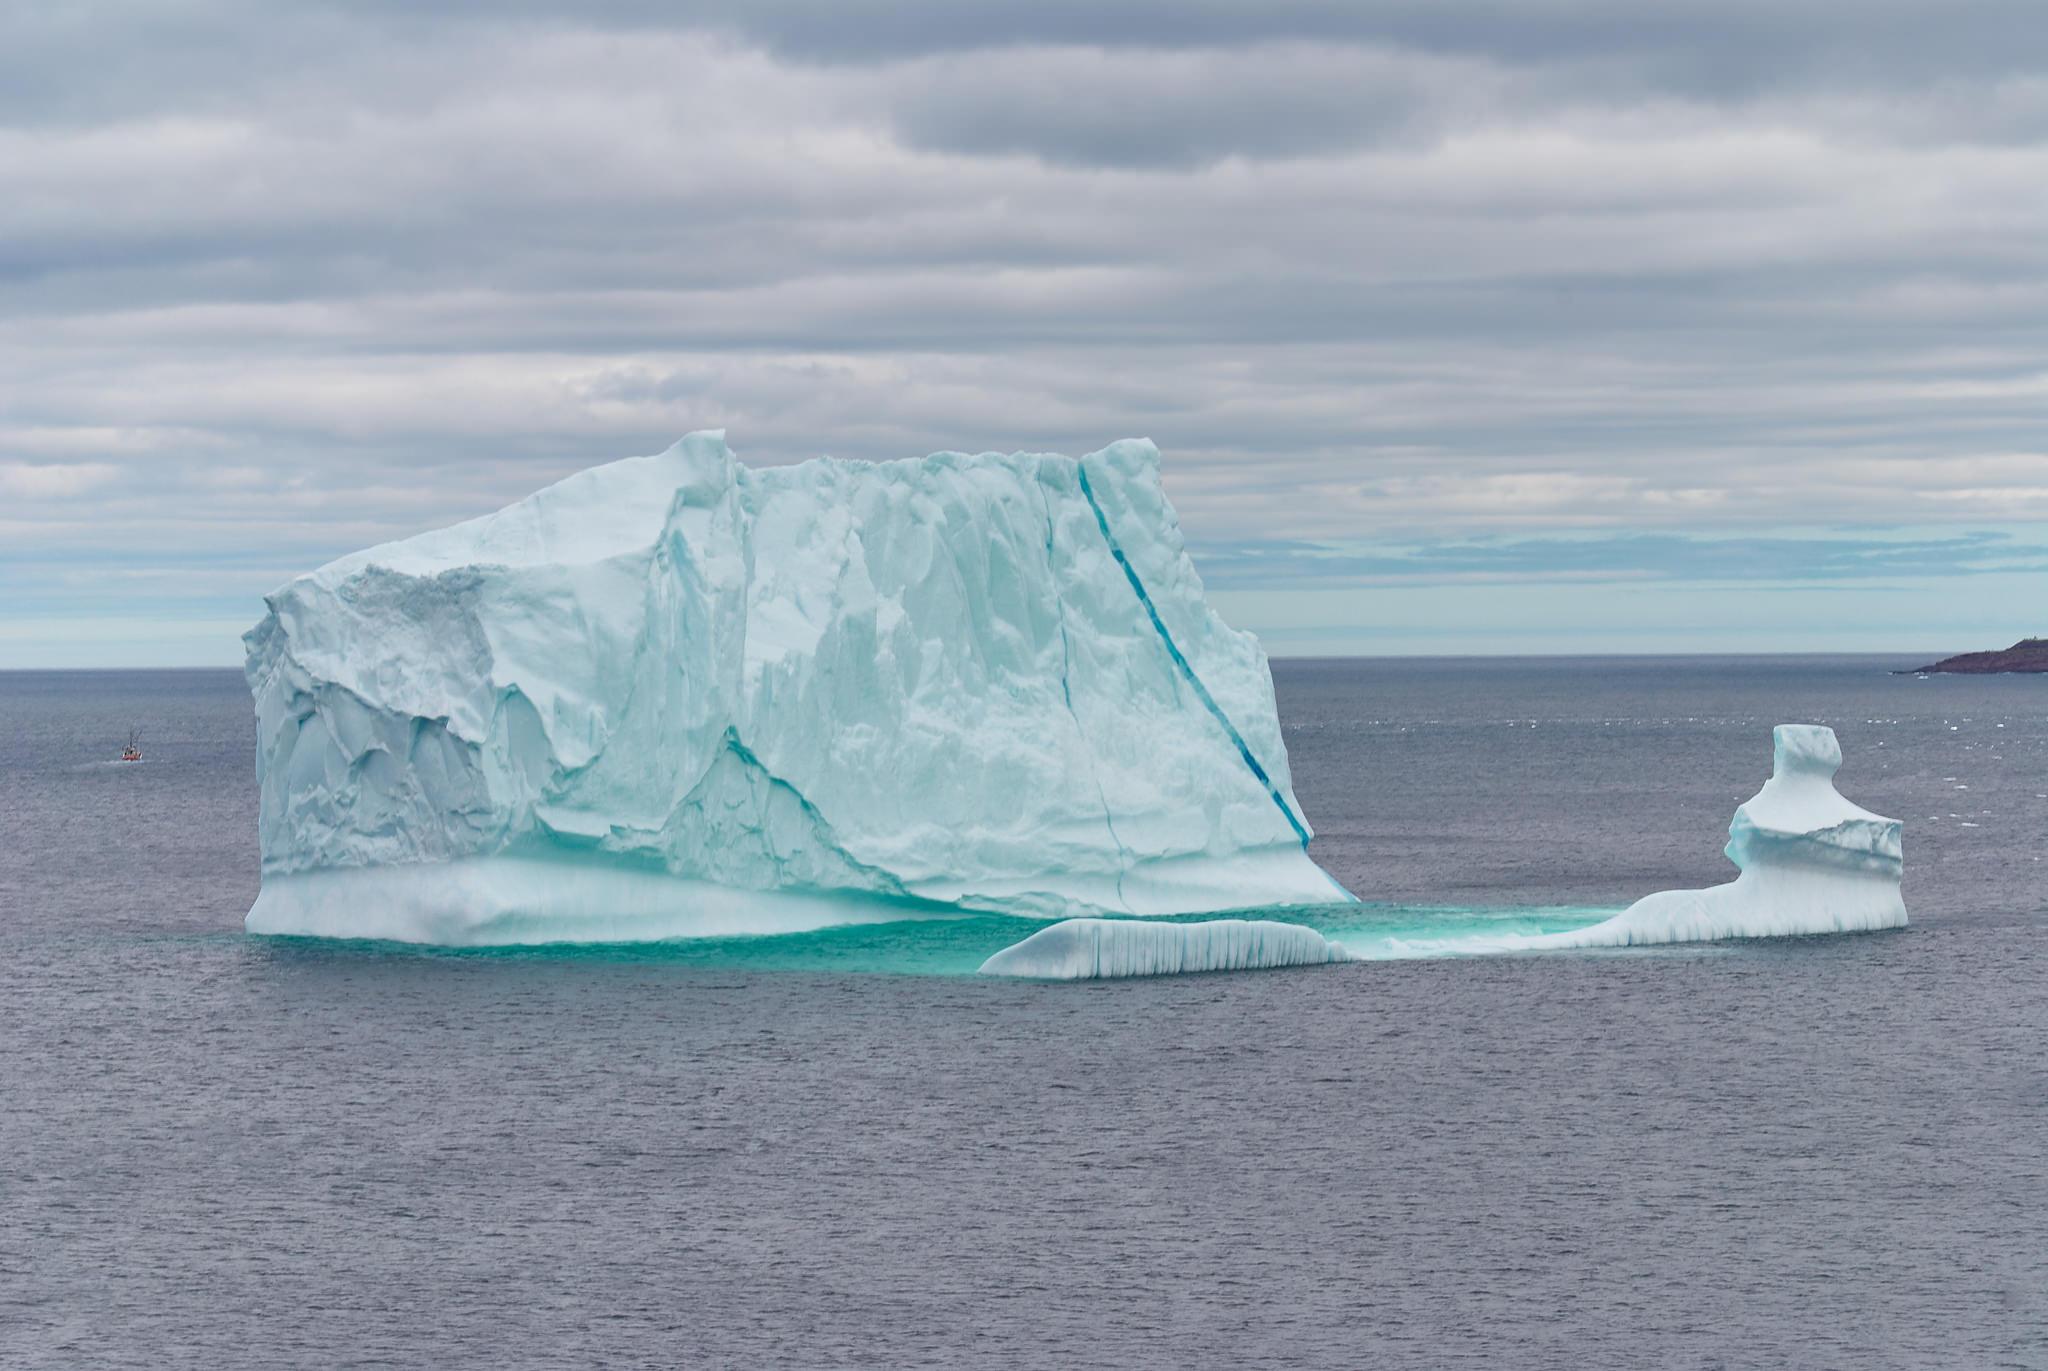 Massive Iceberg off St. John's